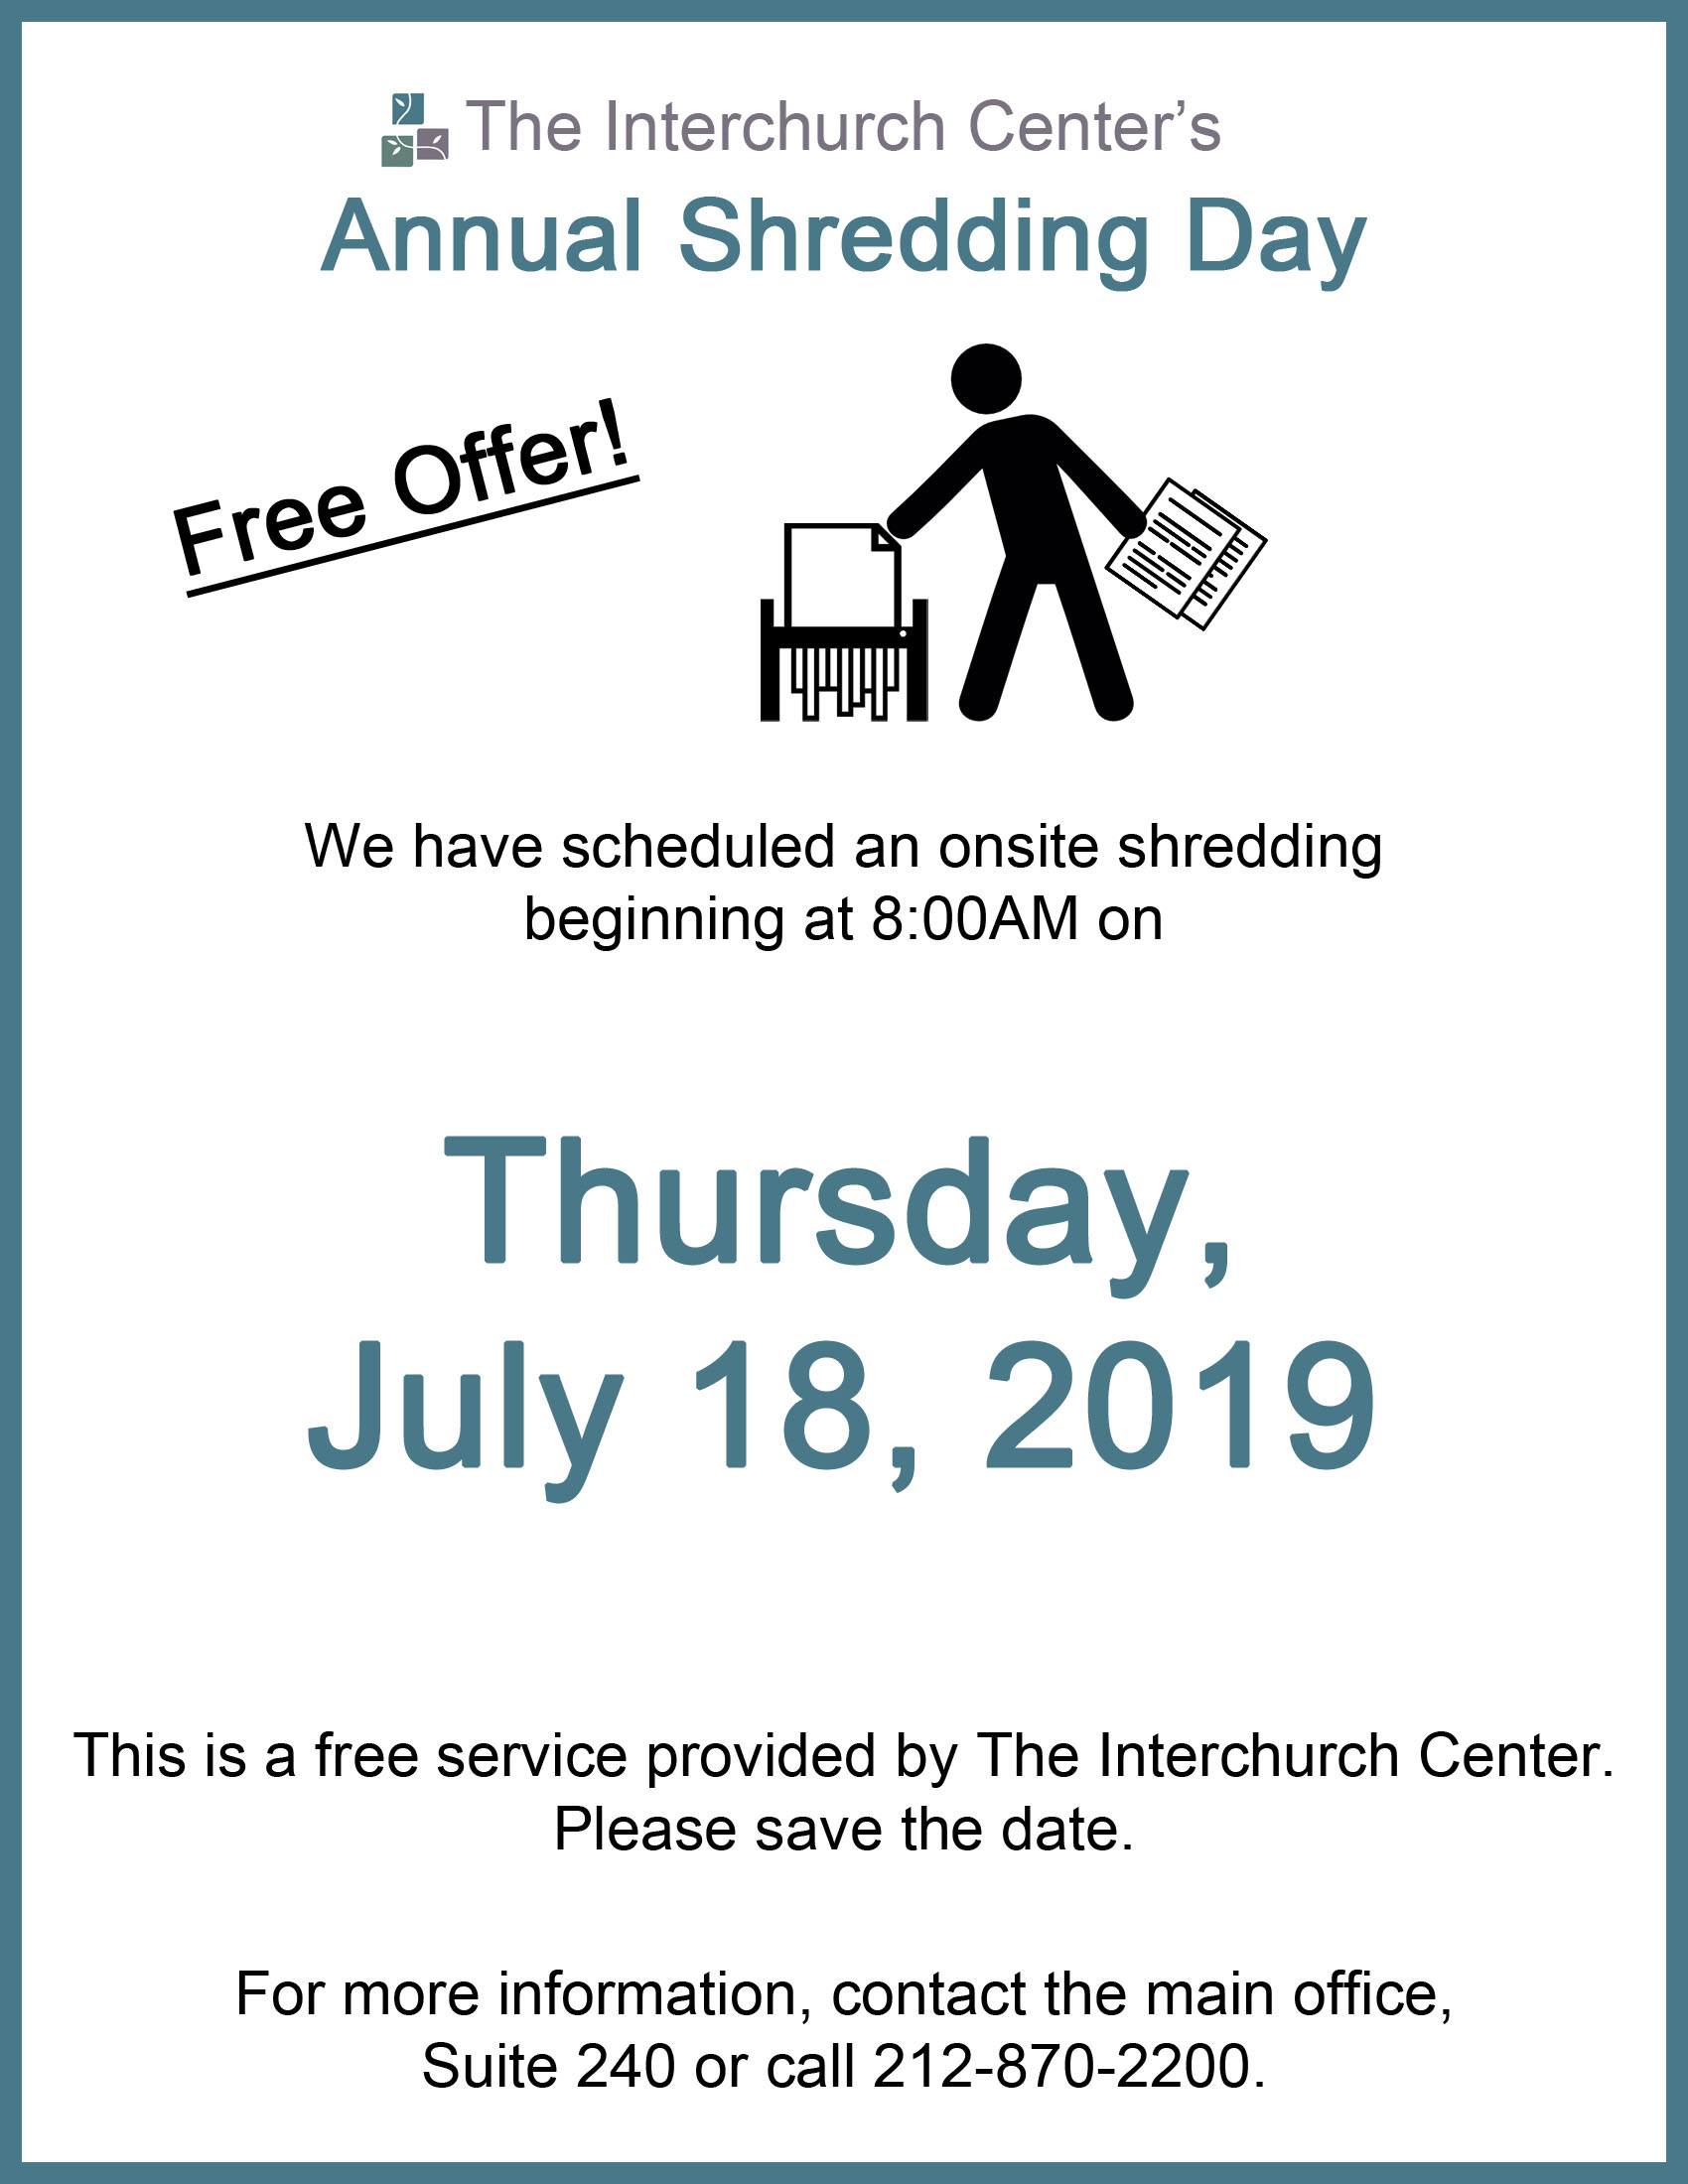 Shredding Day Flyer 2019 | The Interchurch Center